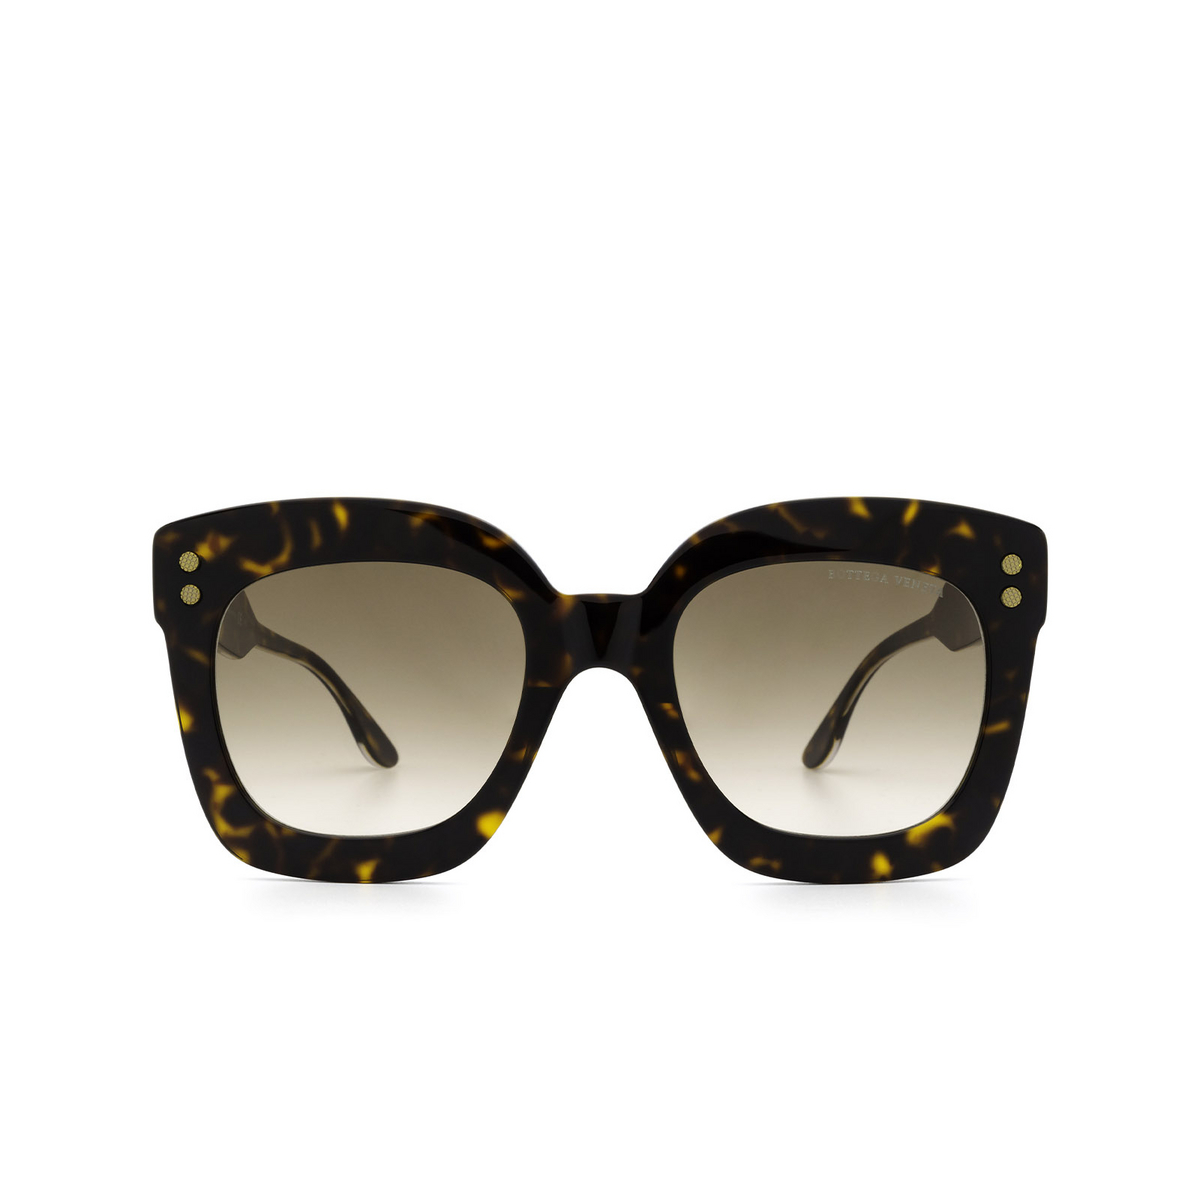 Bottega Veneta® Square Sunglasses: BV0238S color Havana 002 - front view.